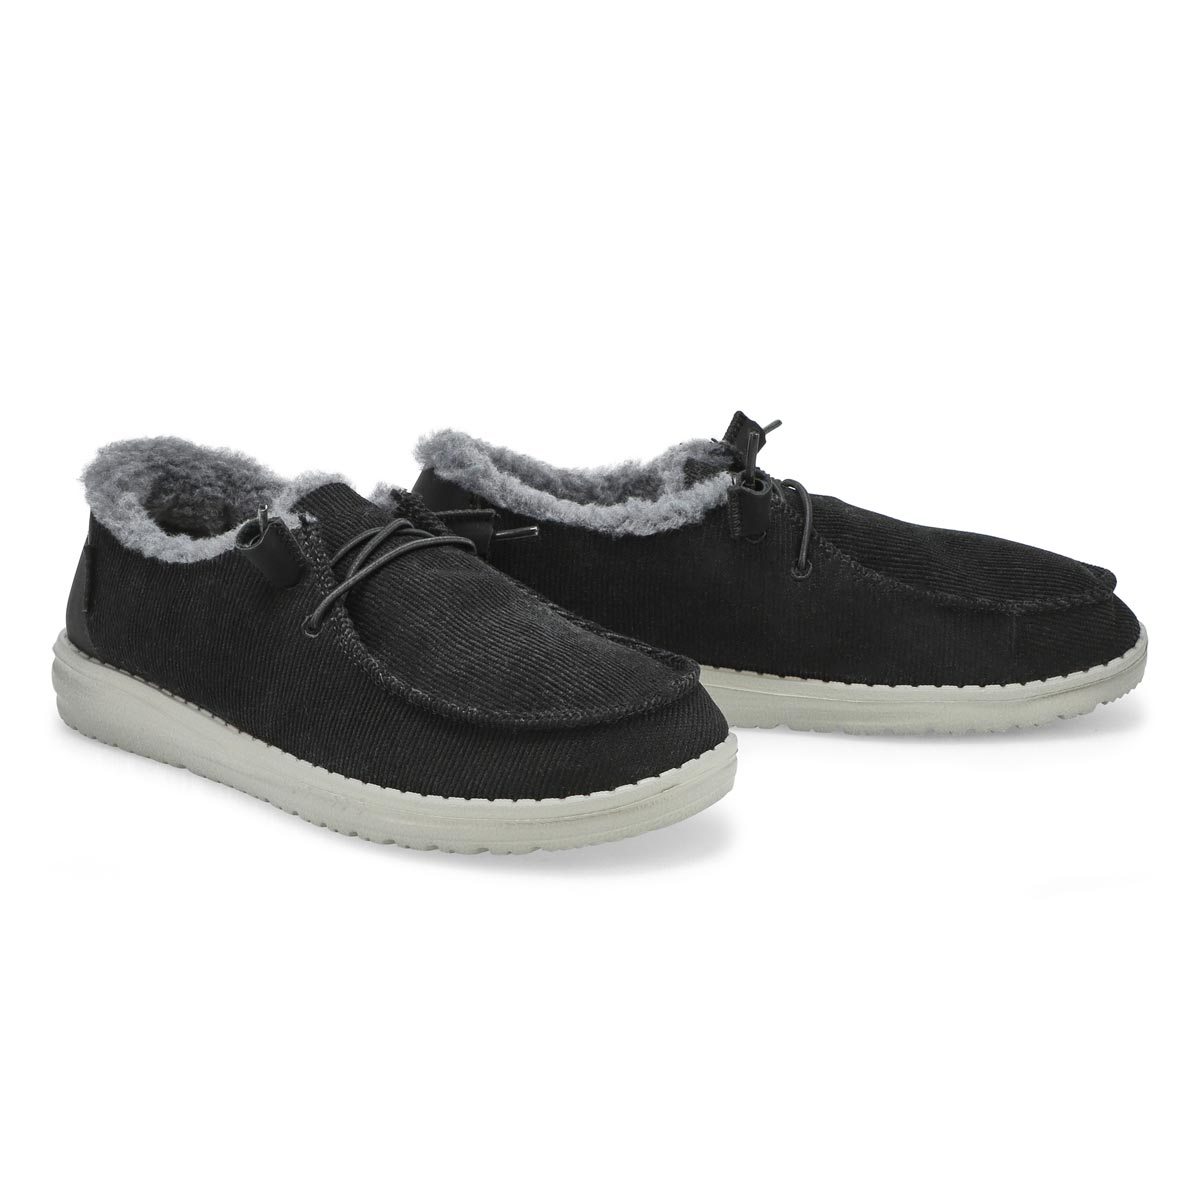 Chaussure tout-aller Wendy Corduroy, femmes - Noir